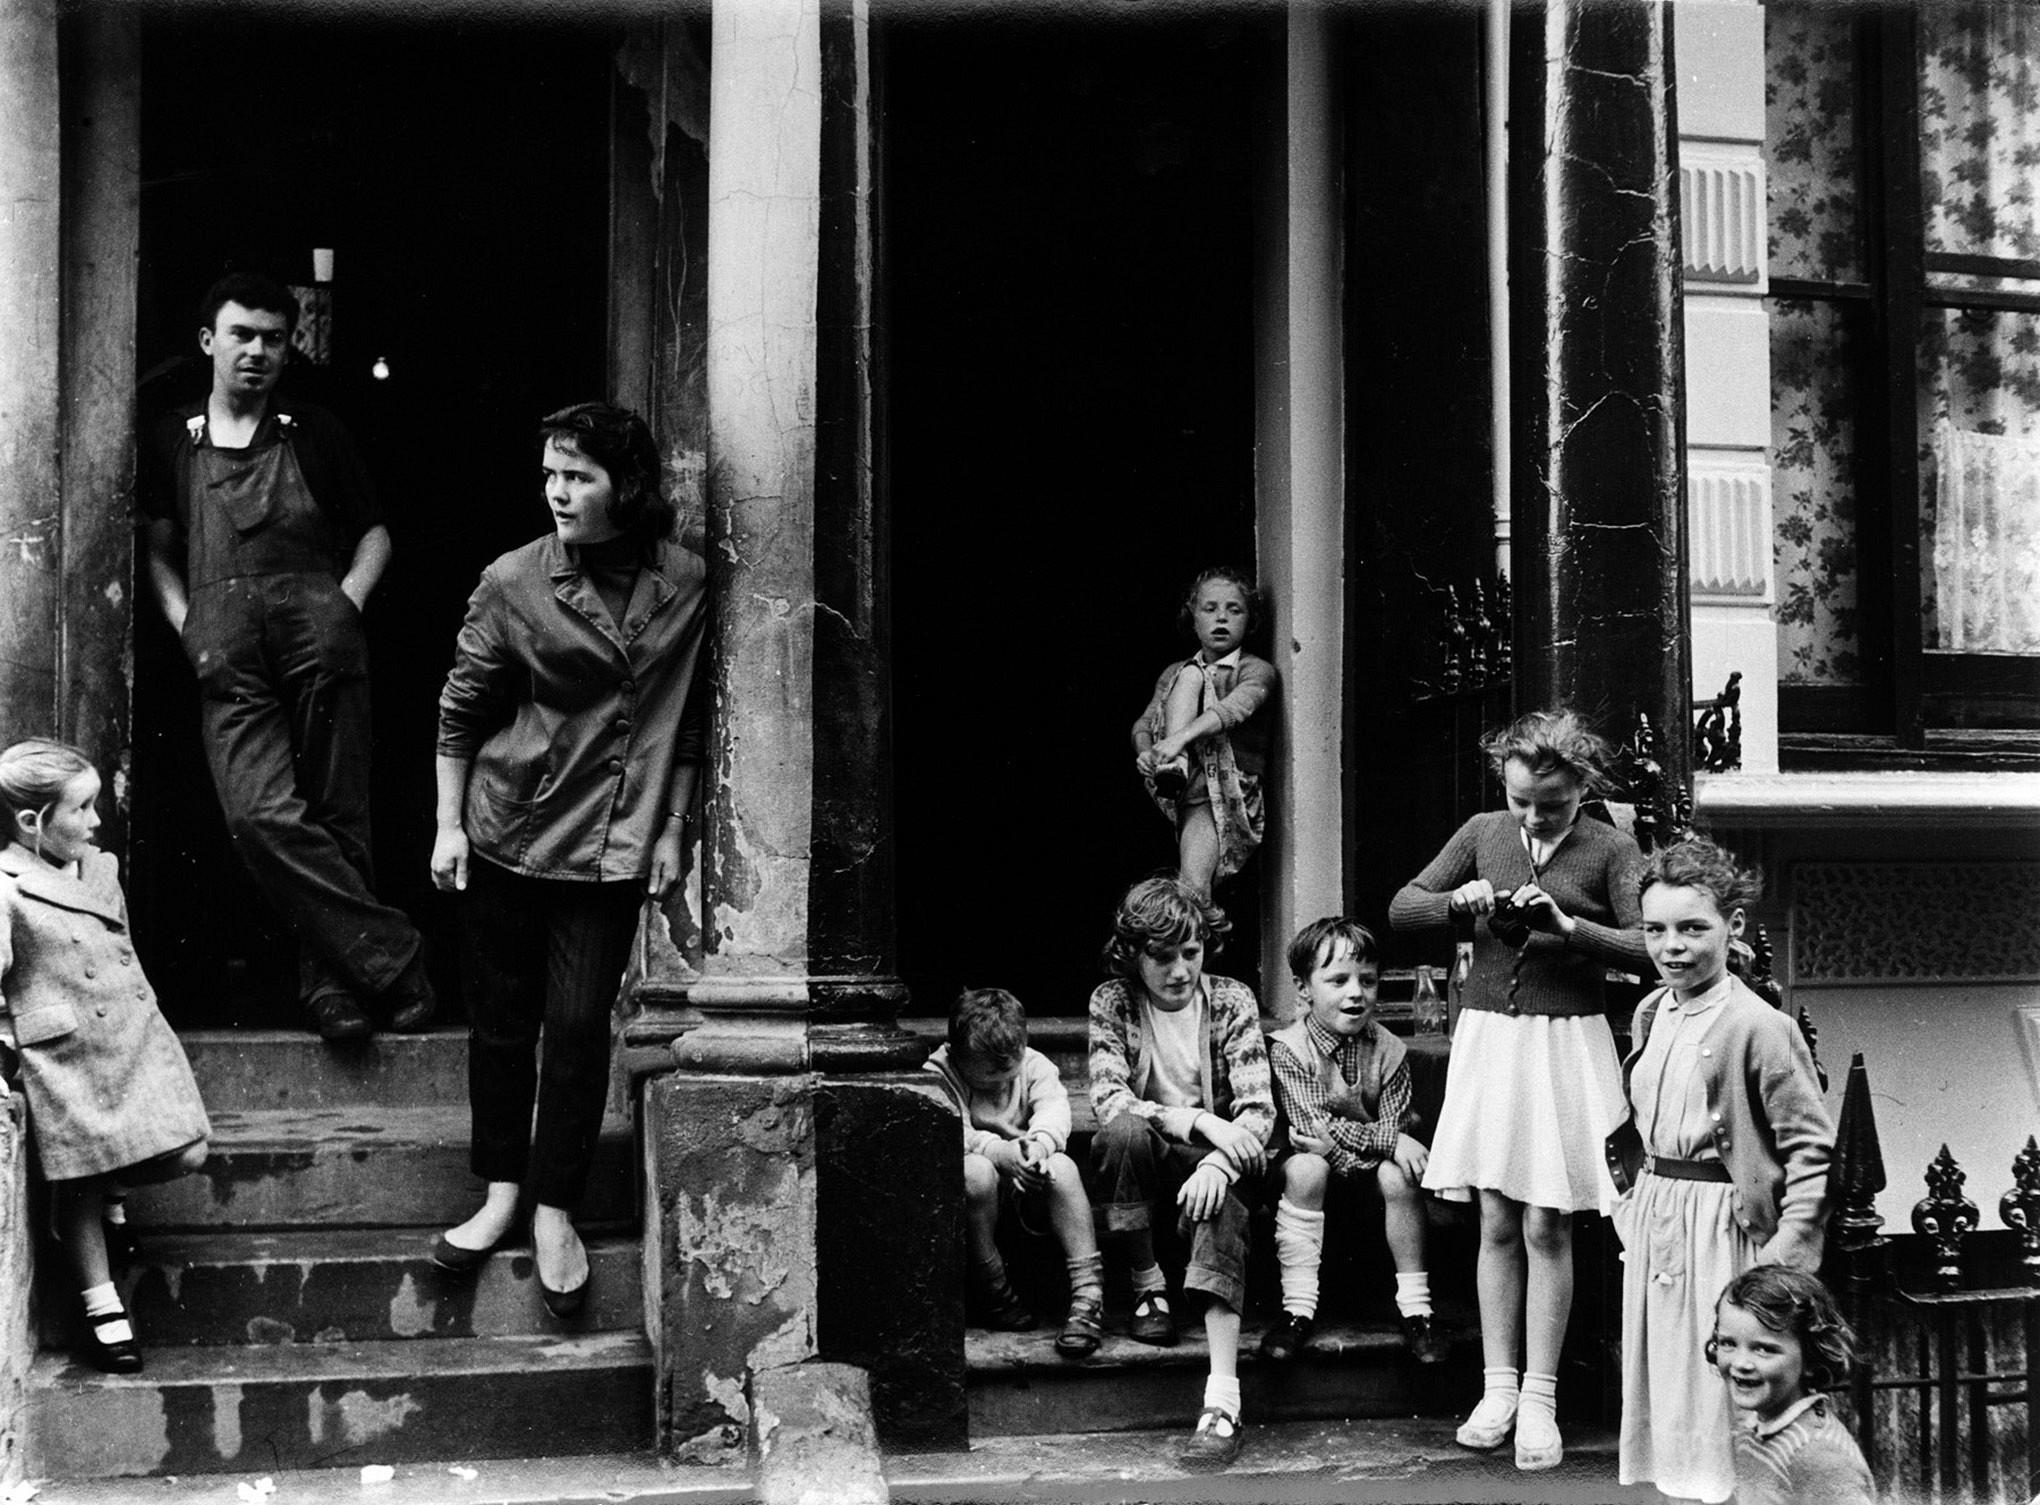 (15) Roger Mayne, Paddington, 1959